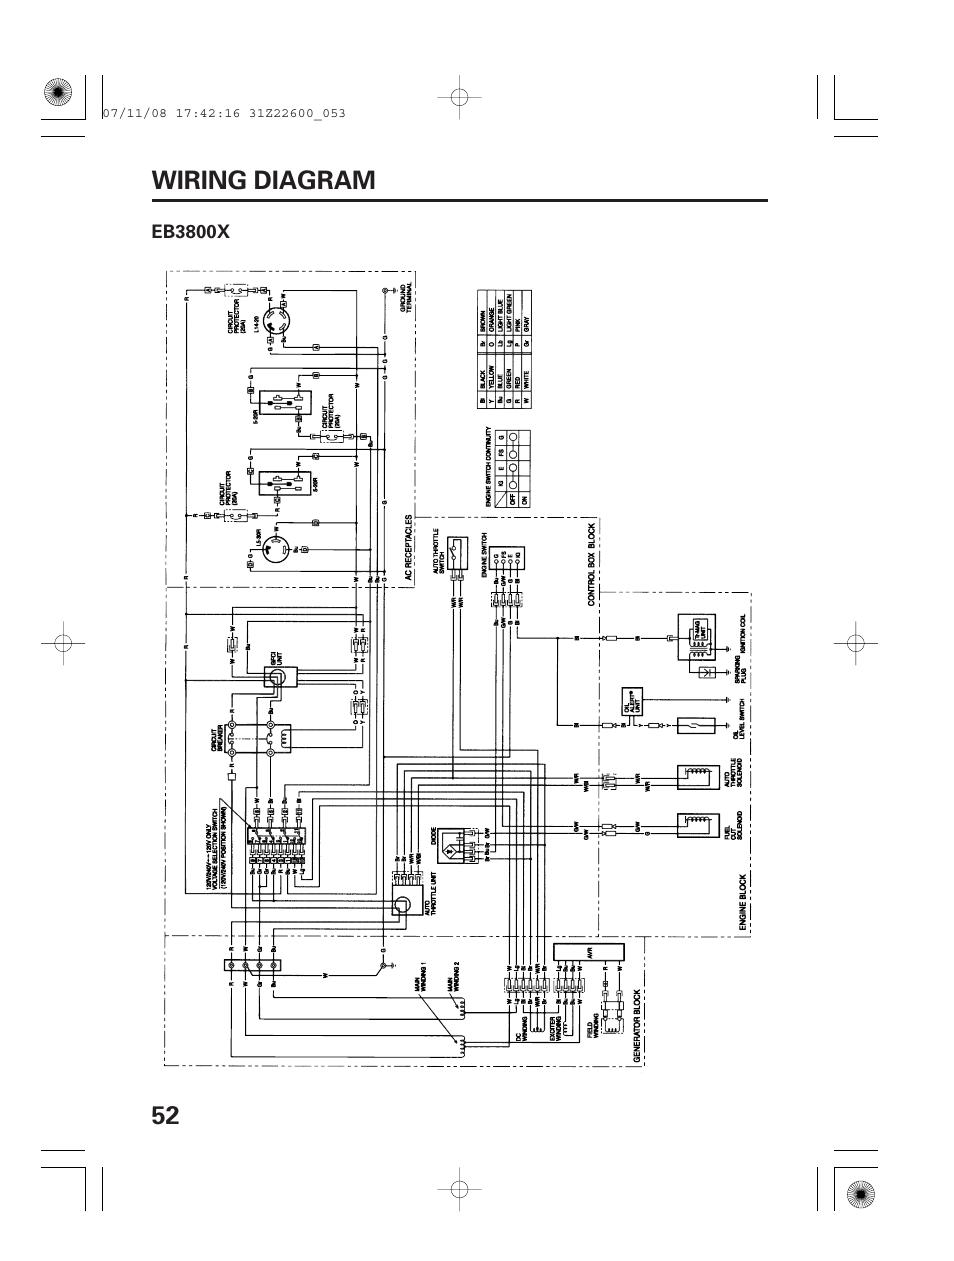 Wiring Diagram Eb3800x 52 Wiring Diagram Honda Eb5000x User Manual Page 54 71